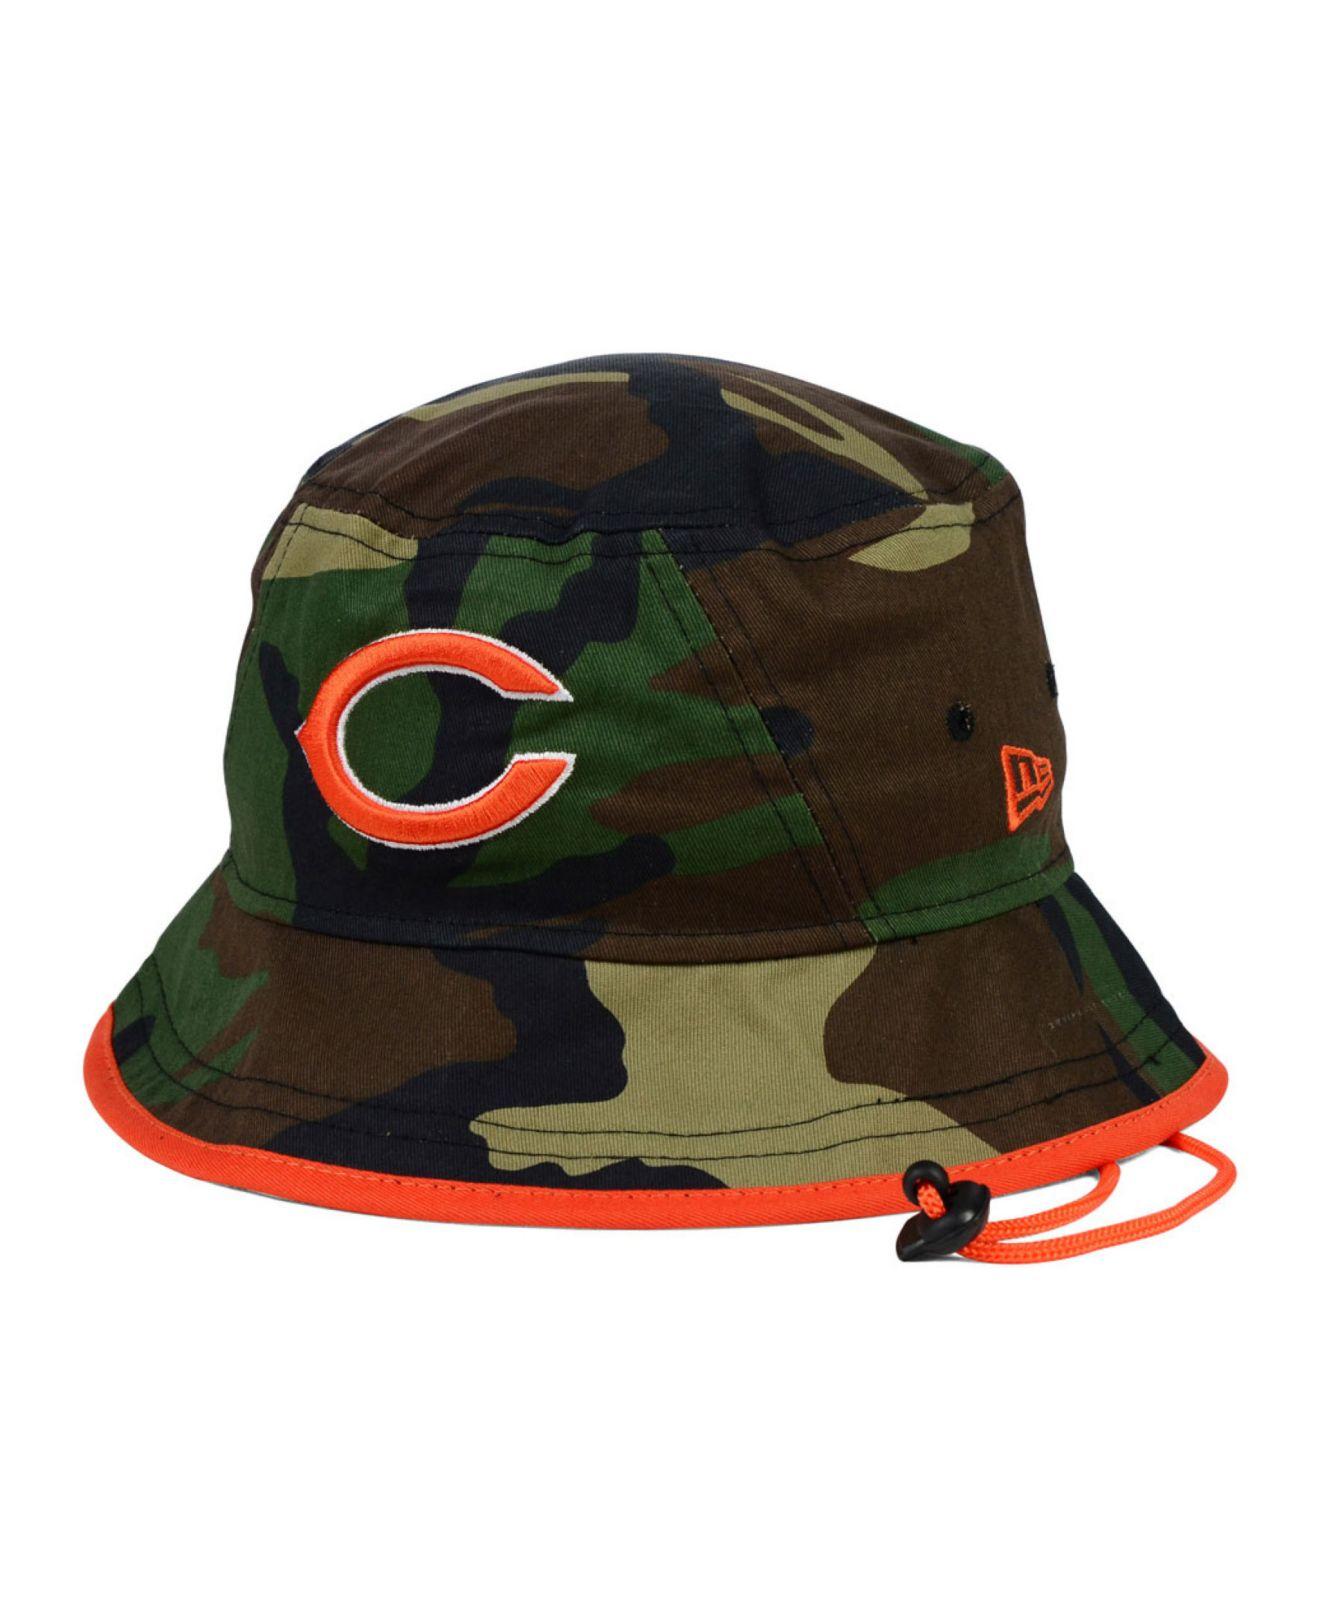 b2e88c8ff34 Lyst - KTZ Chicago Bears Camo Pop Bucket Hat in Green for Men